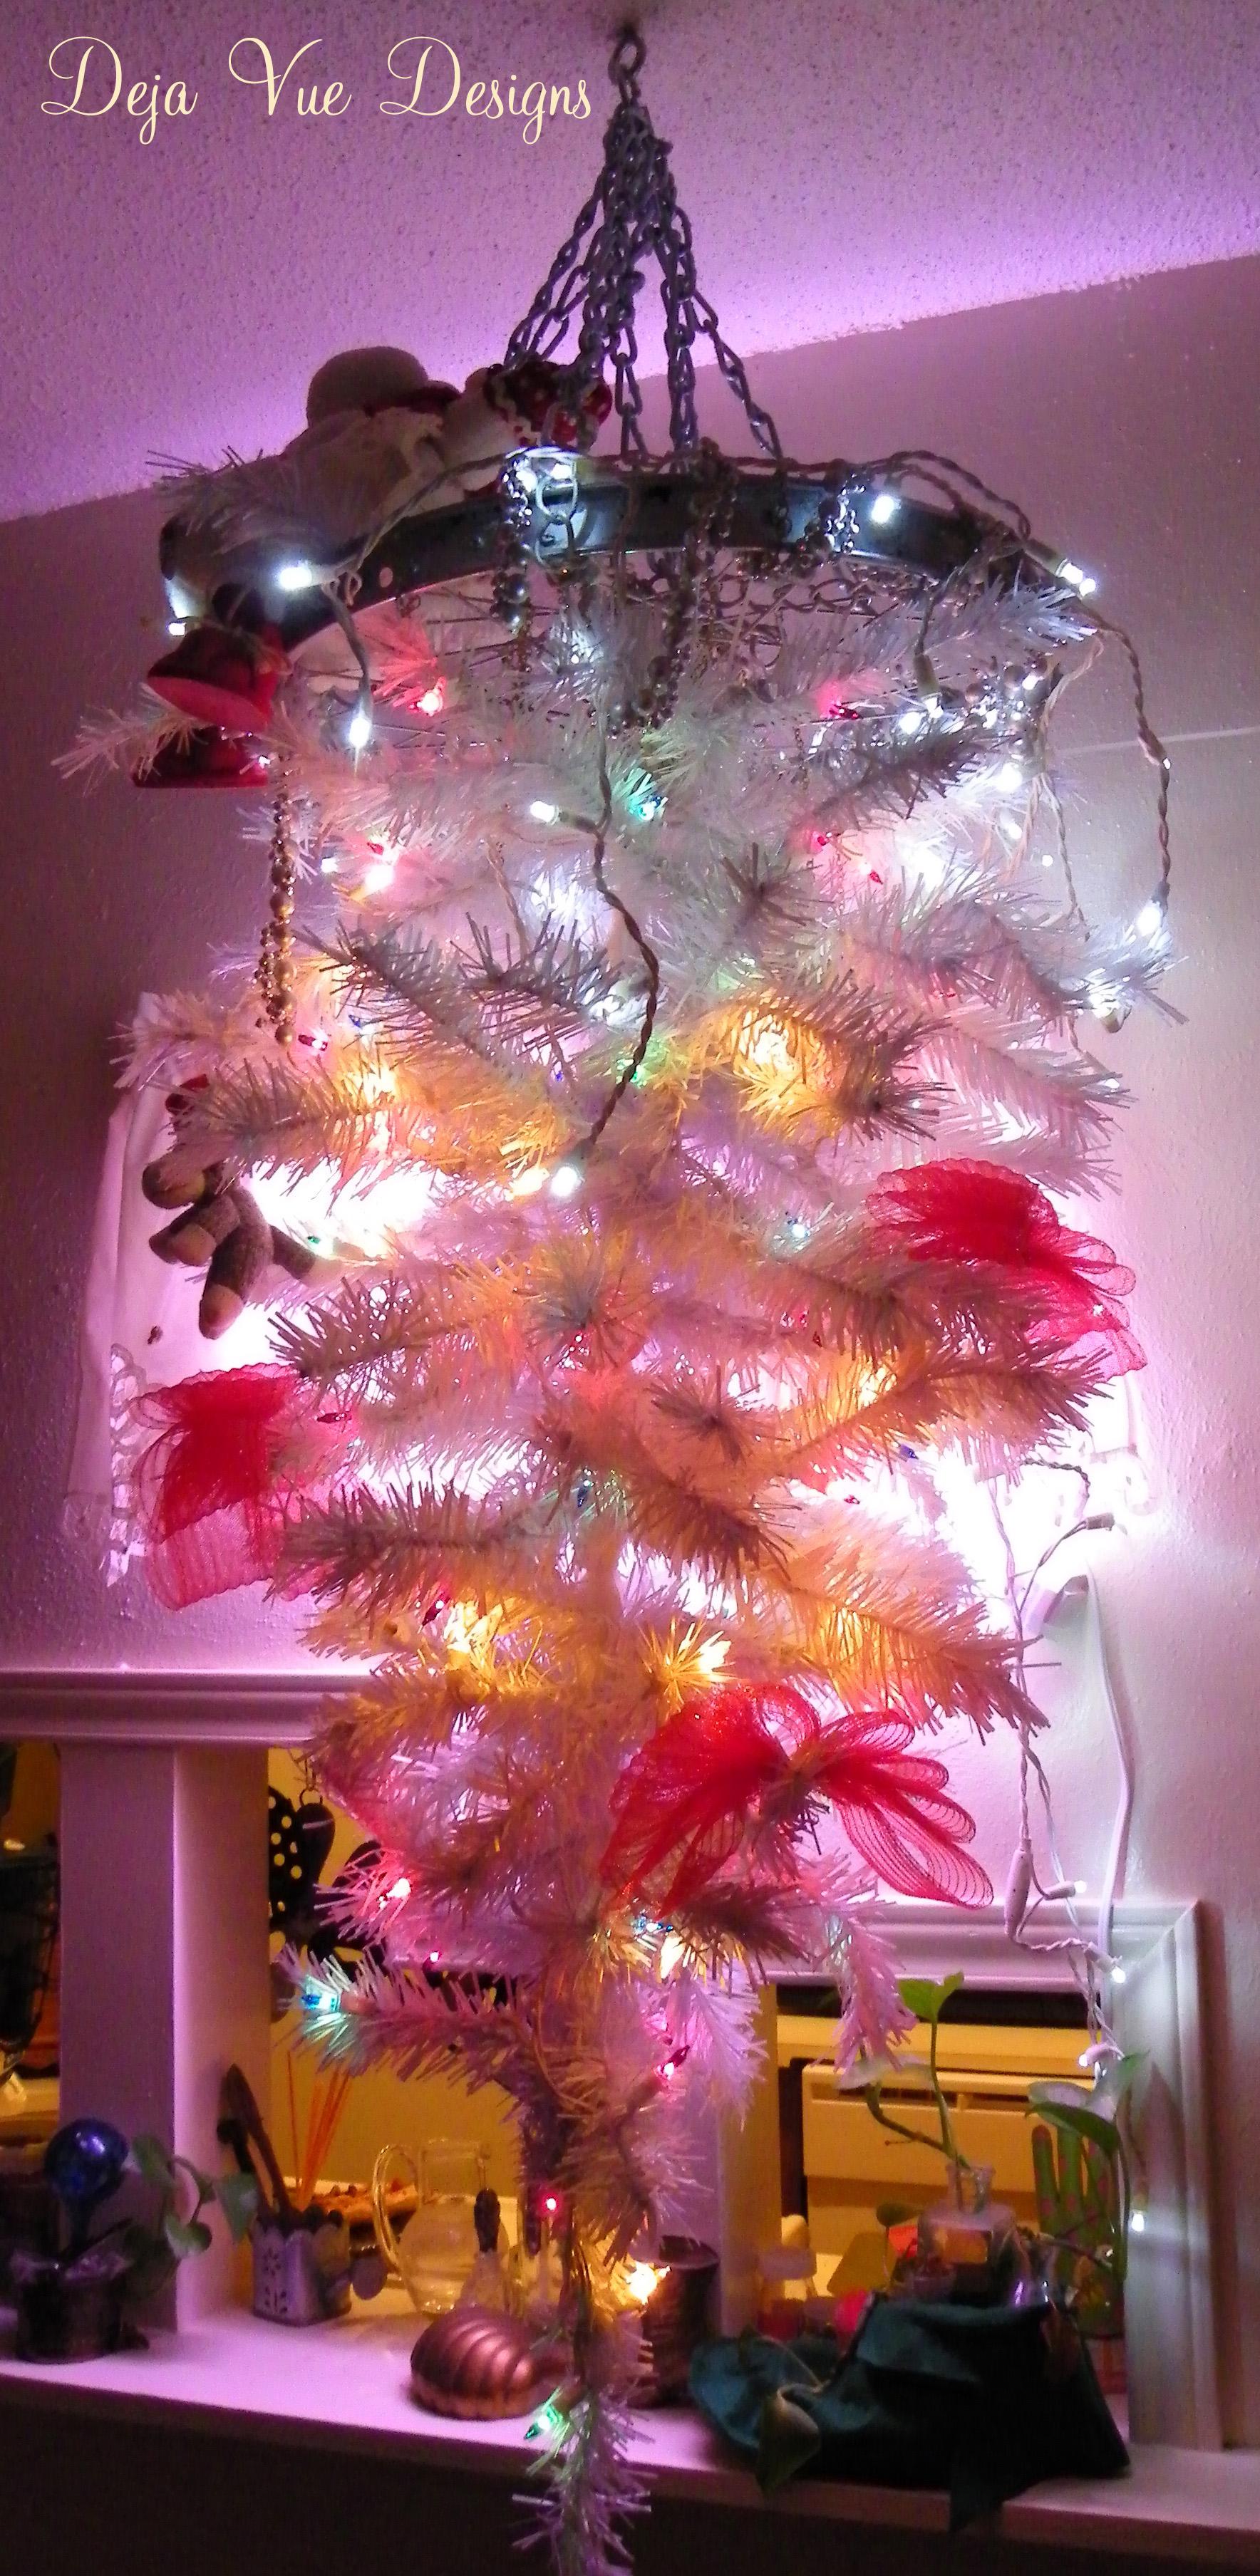 My sister's Christmas tree